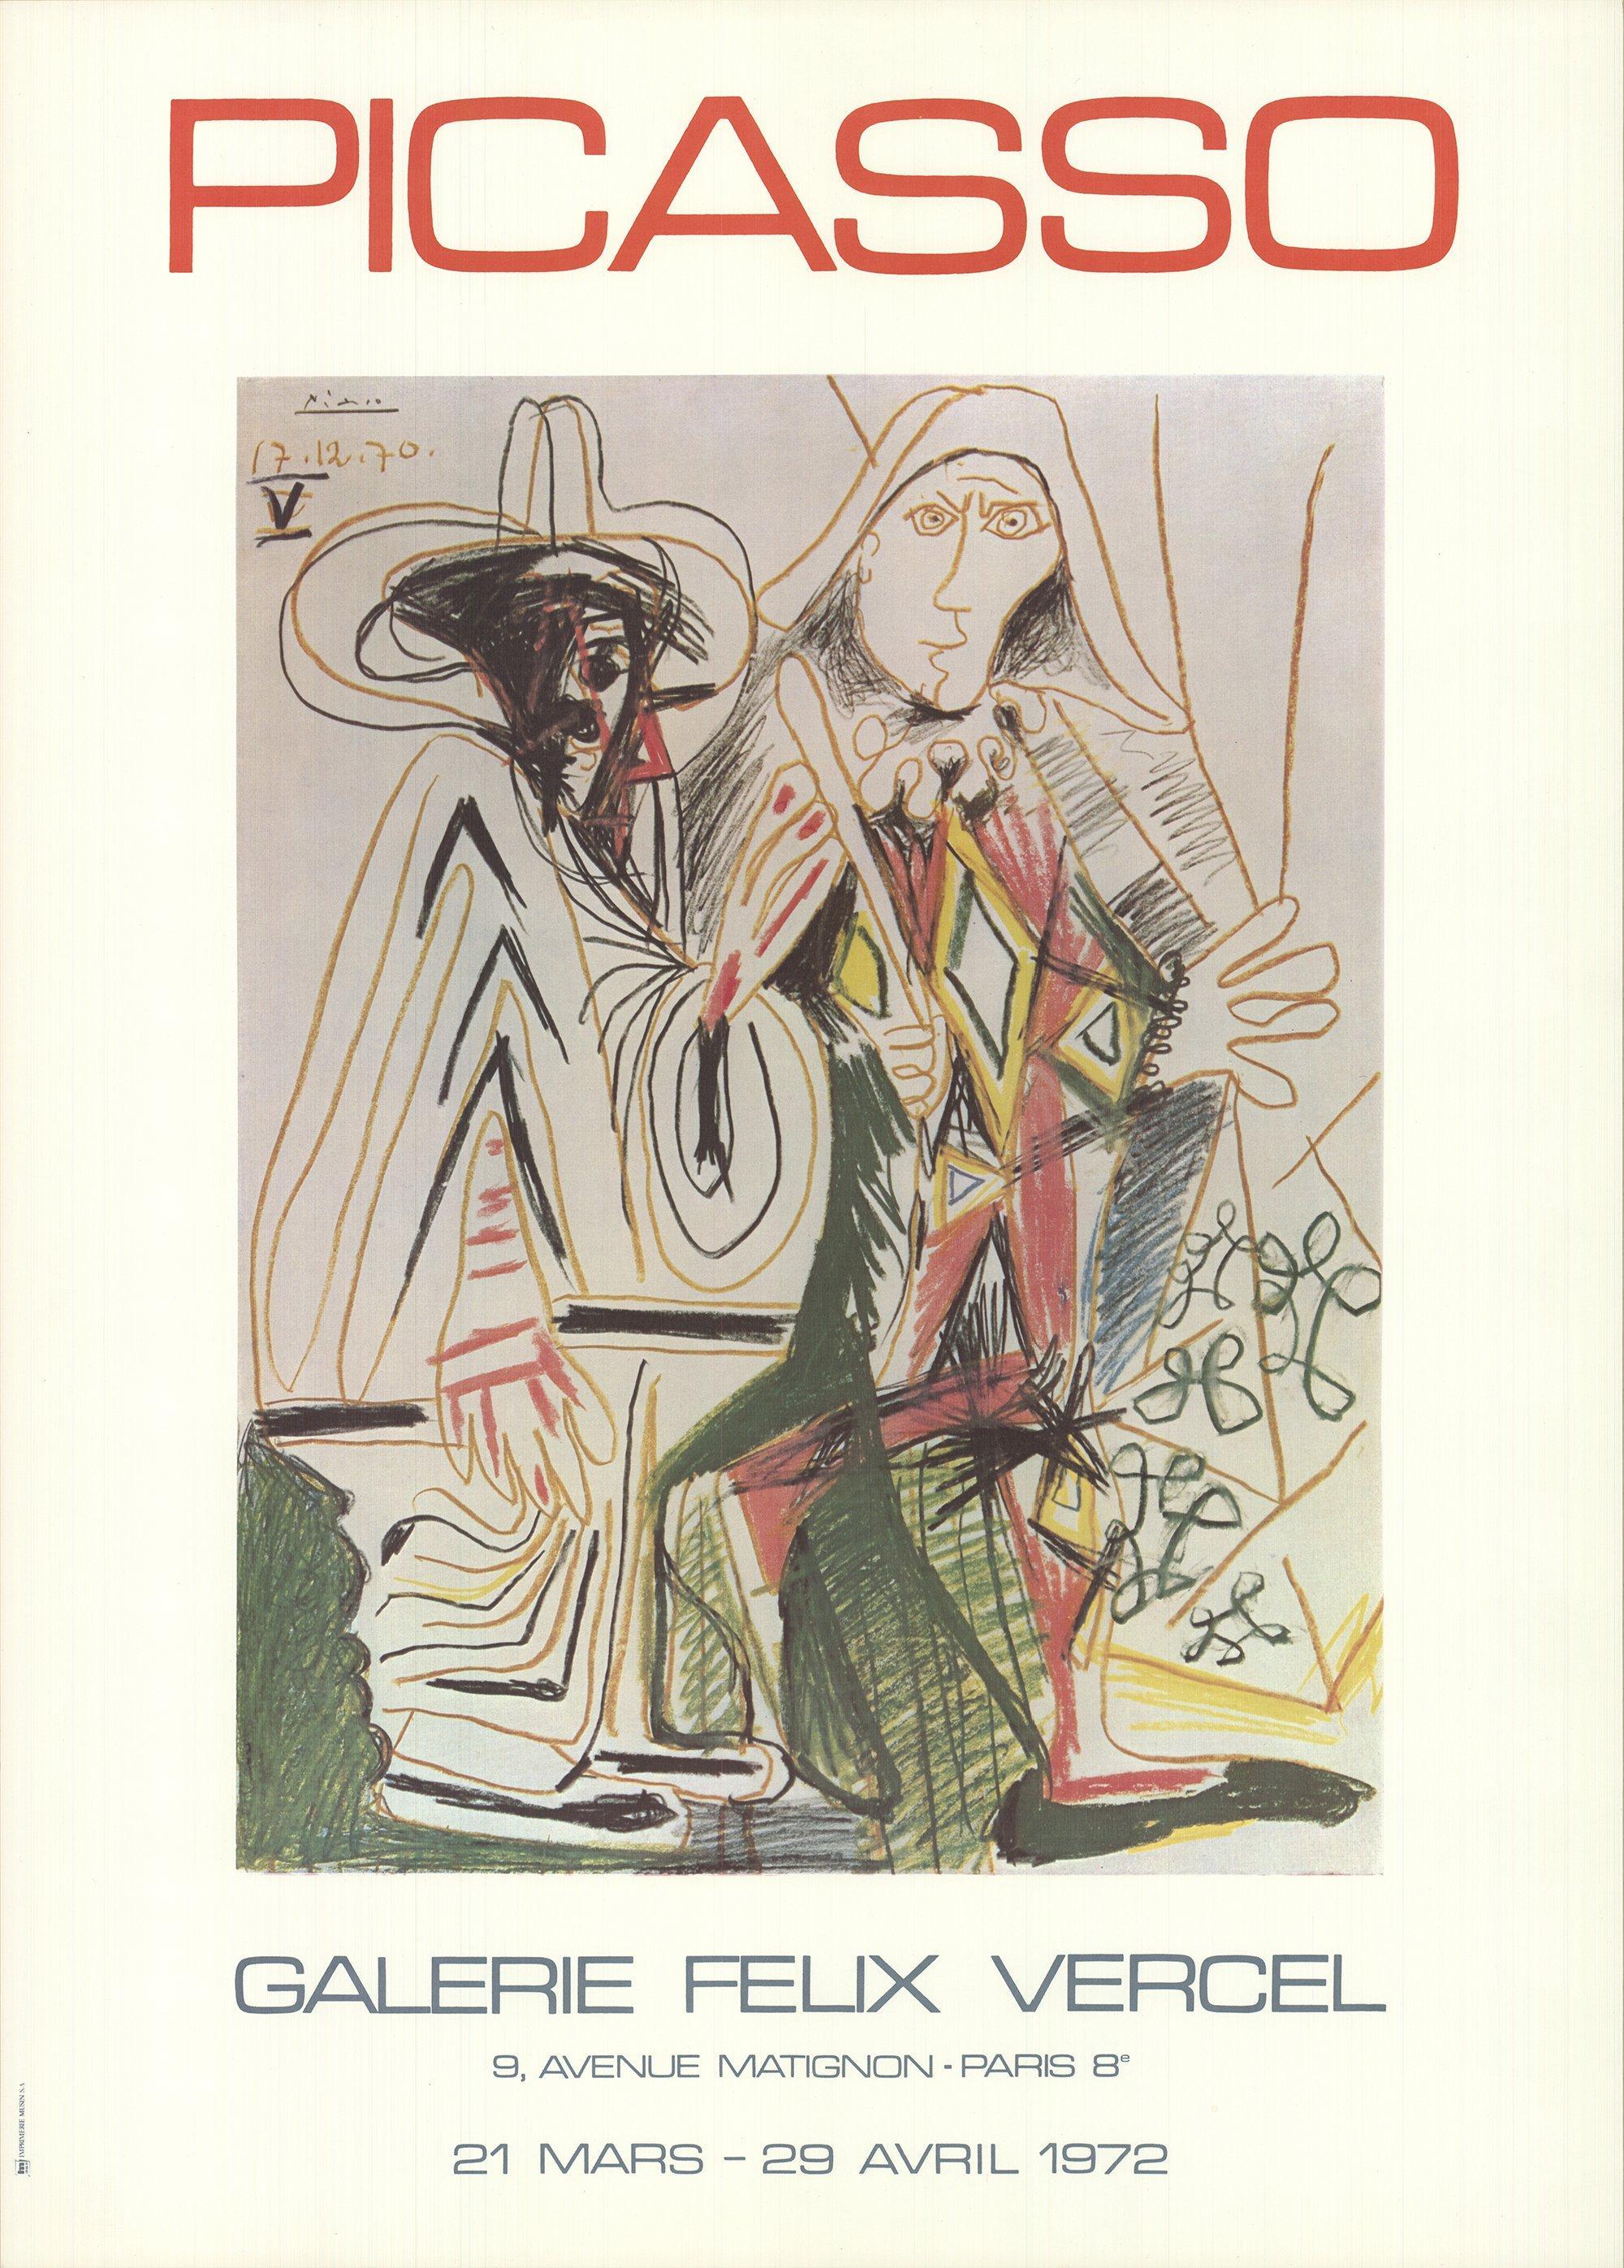 1972 After Pablo Picasso 'Galerie Felix Vercel' Cubism France Offset Lithograph